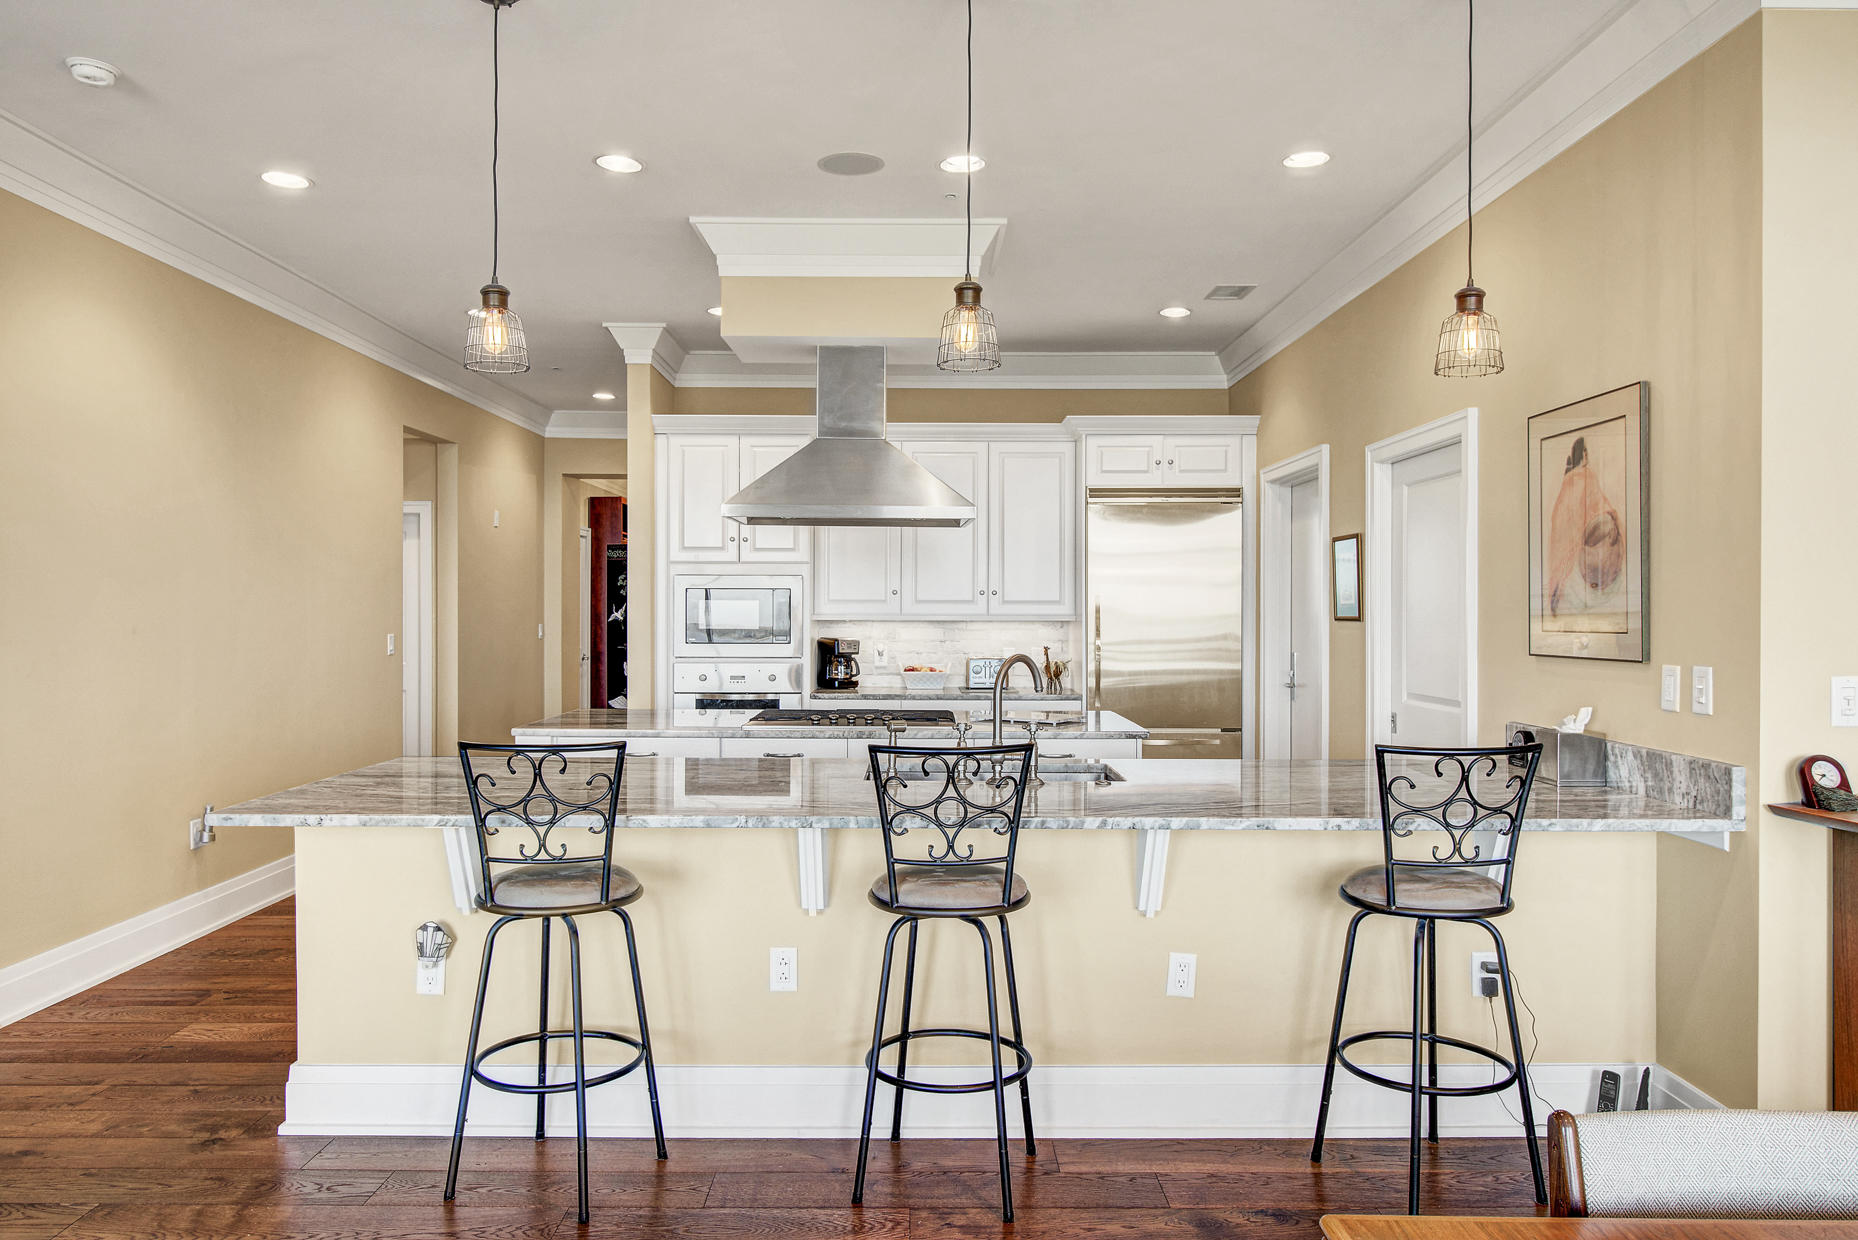 Tides Condominiums Condos For Sale - 142 Cooper River, Mount Pleasant, SC - 40